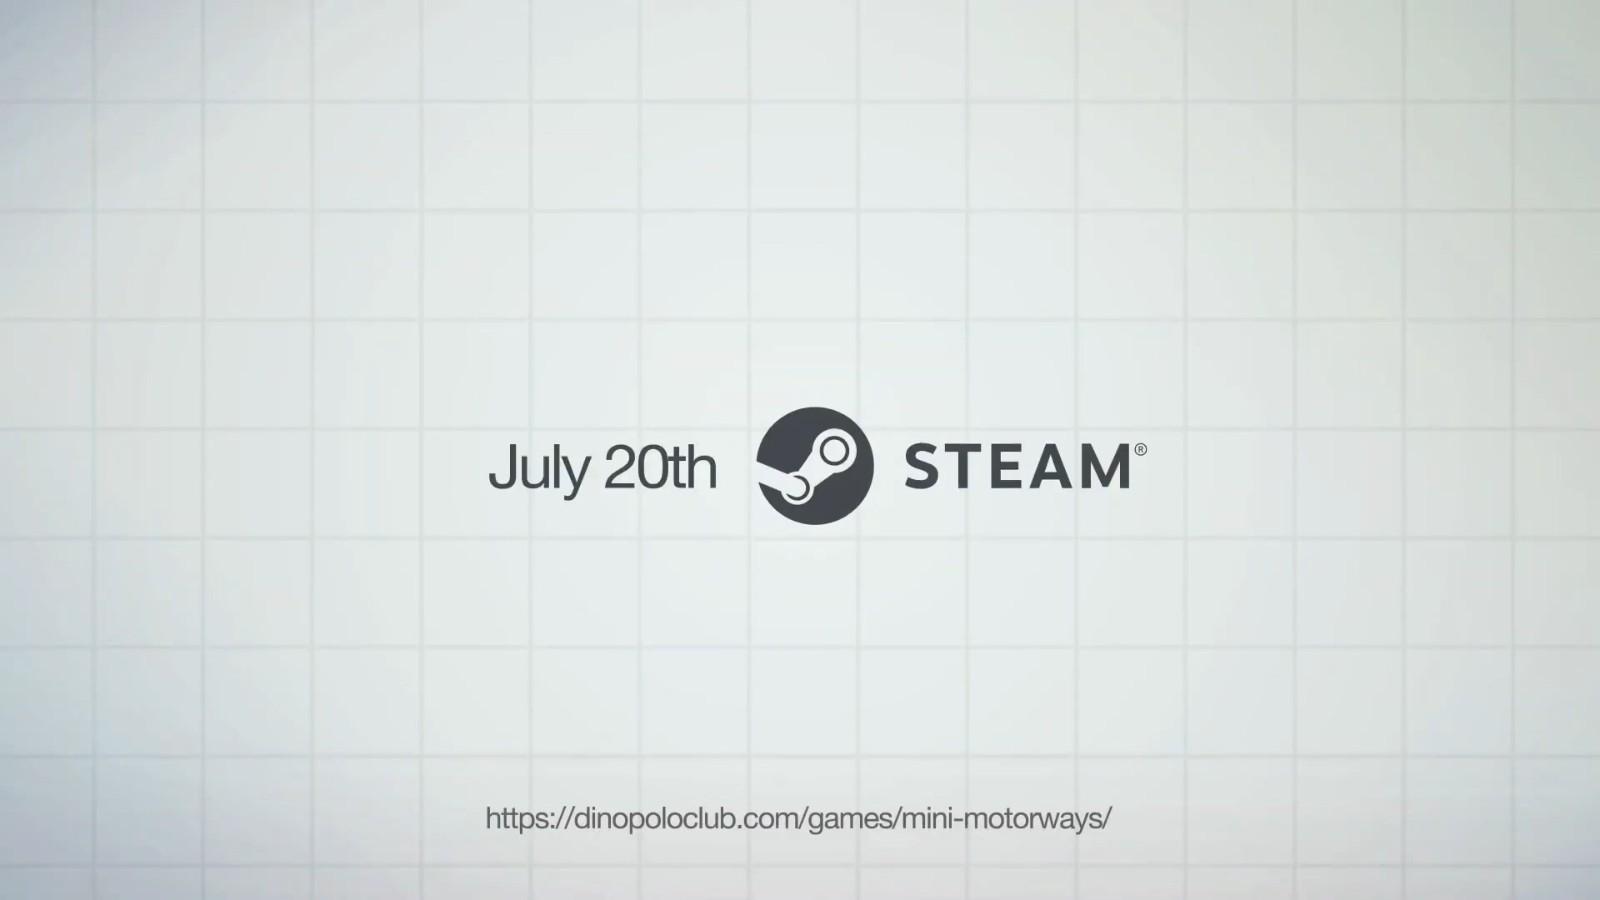 IOS獨占策略模擬游戲《迷你高速公路》7月20日登陸Steam截圖